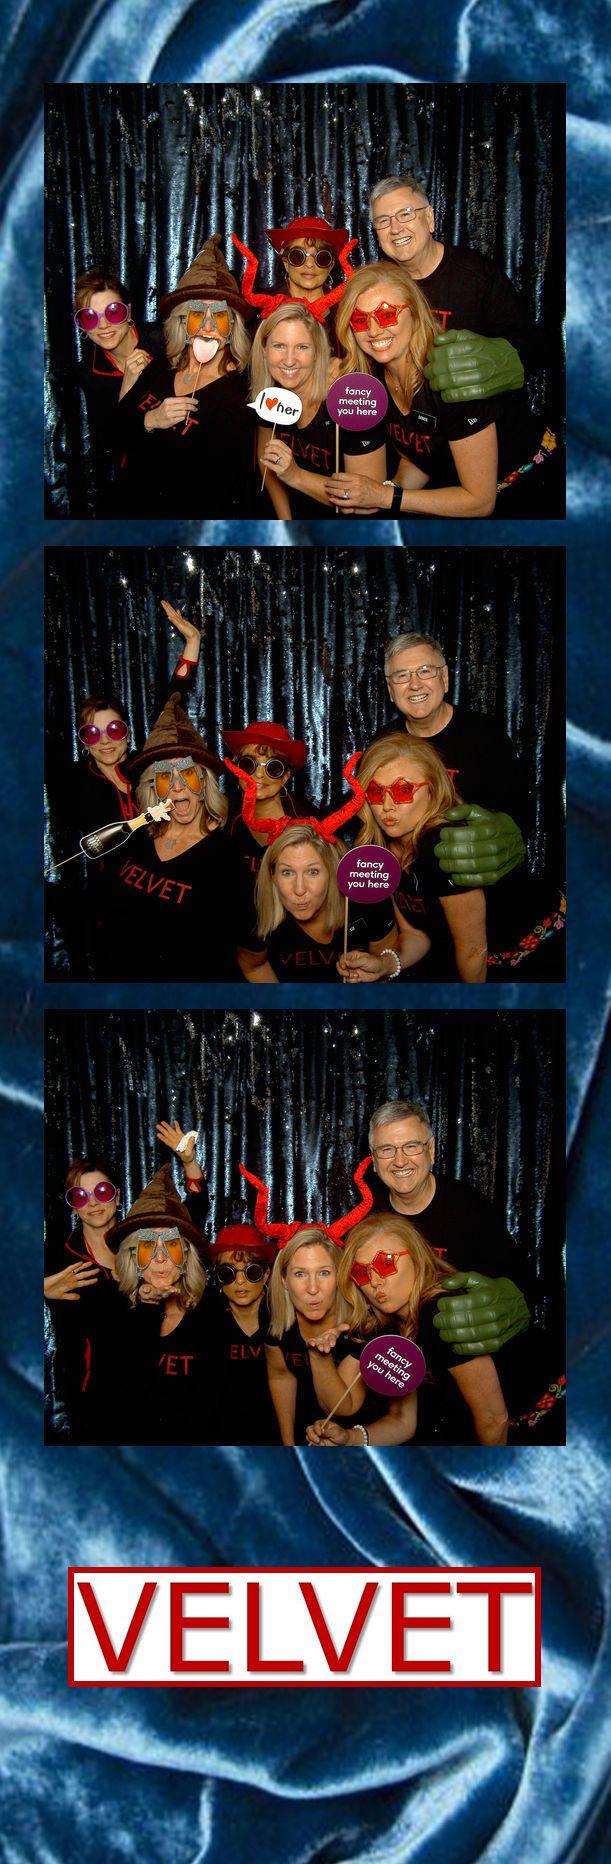 Delta Airlines - Velvet Party